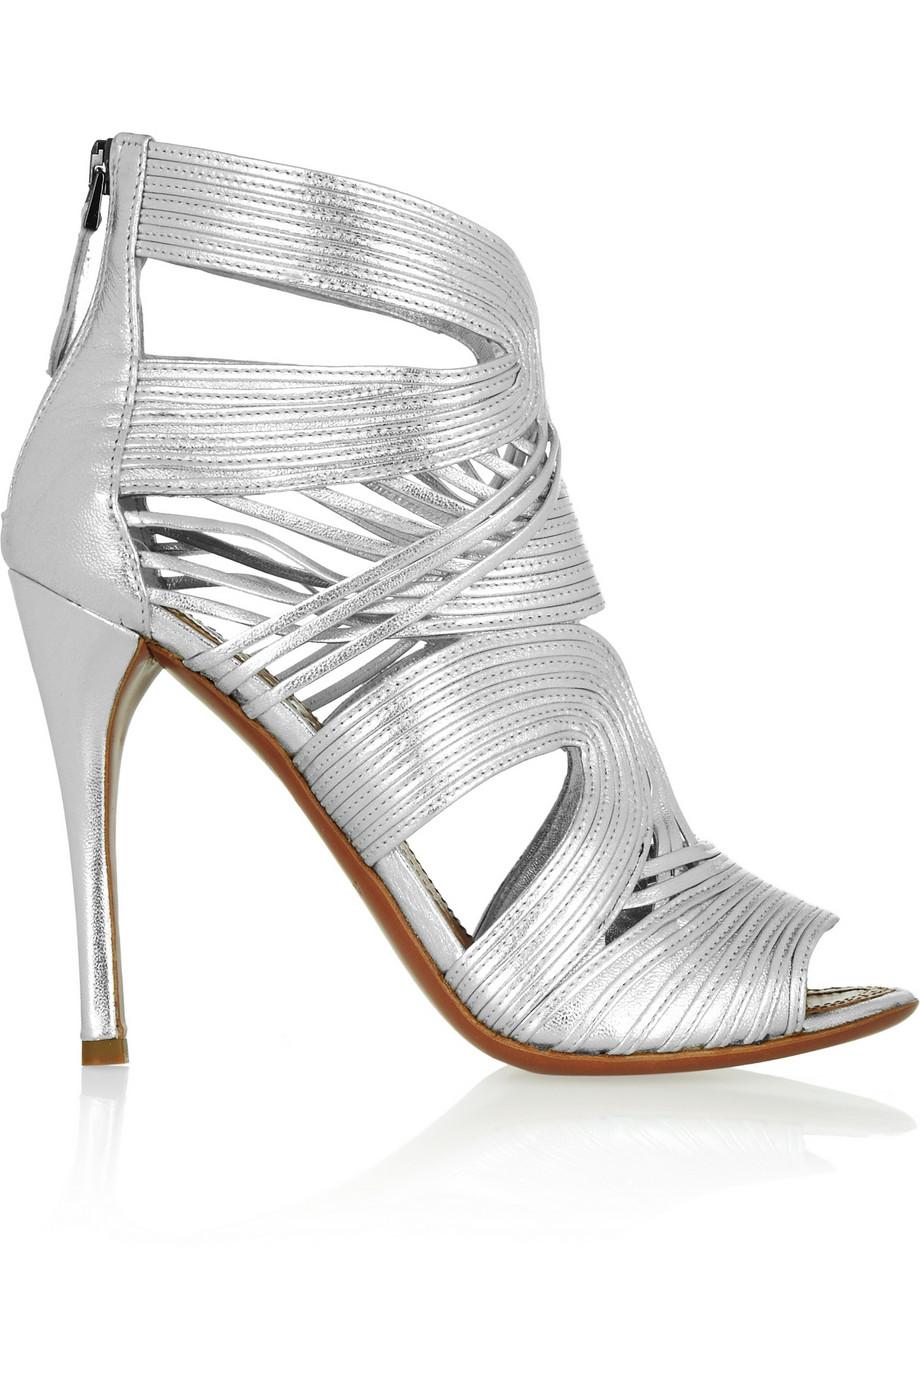 Alaïa Multi-strap metallic leather sandals